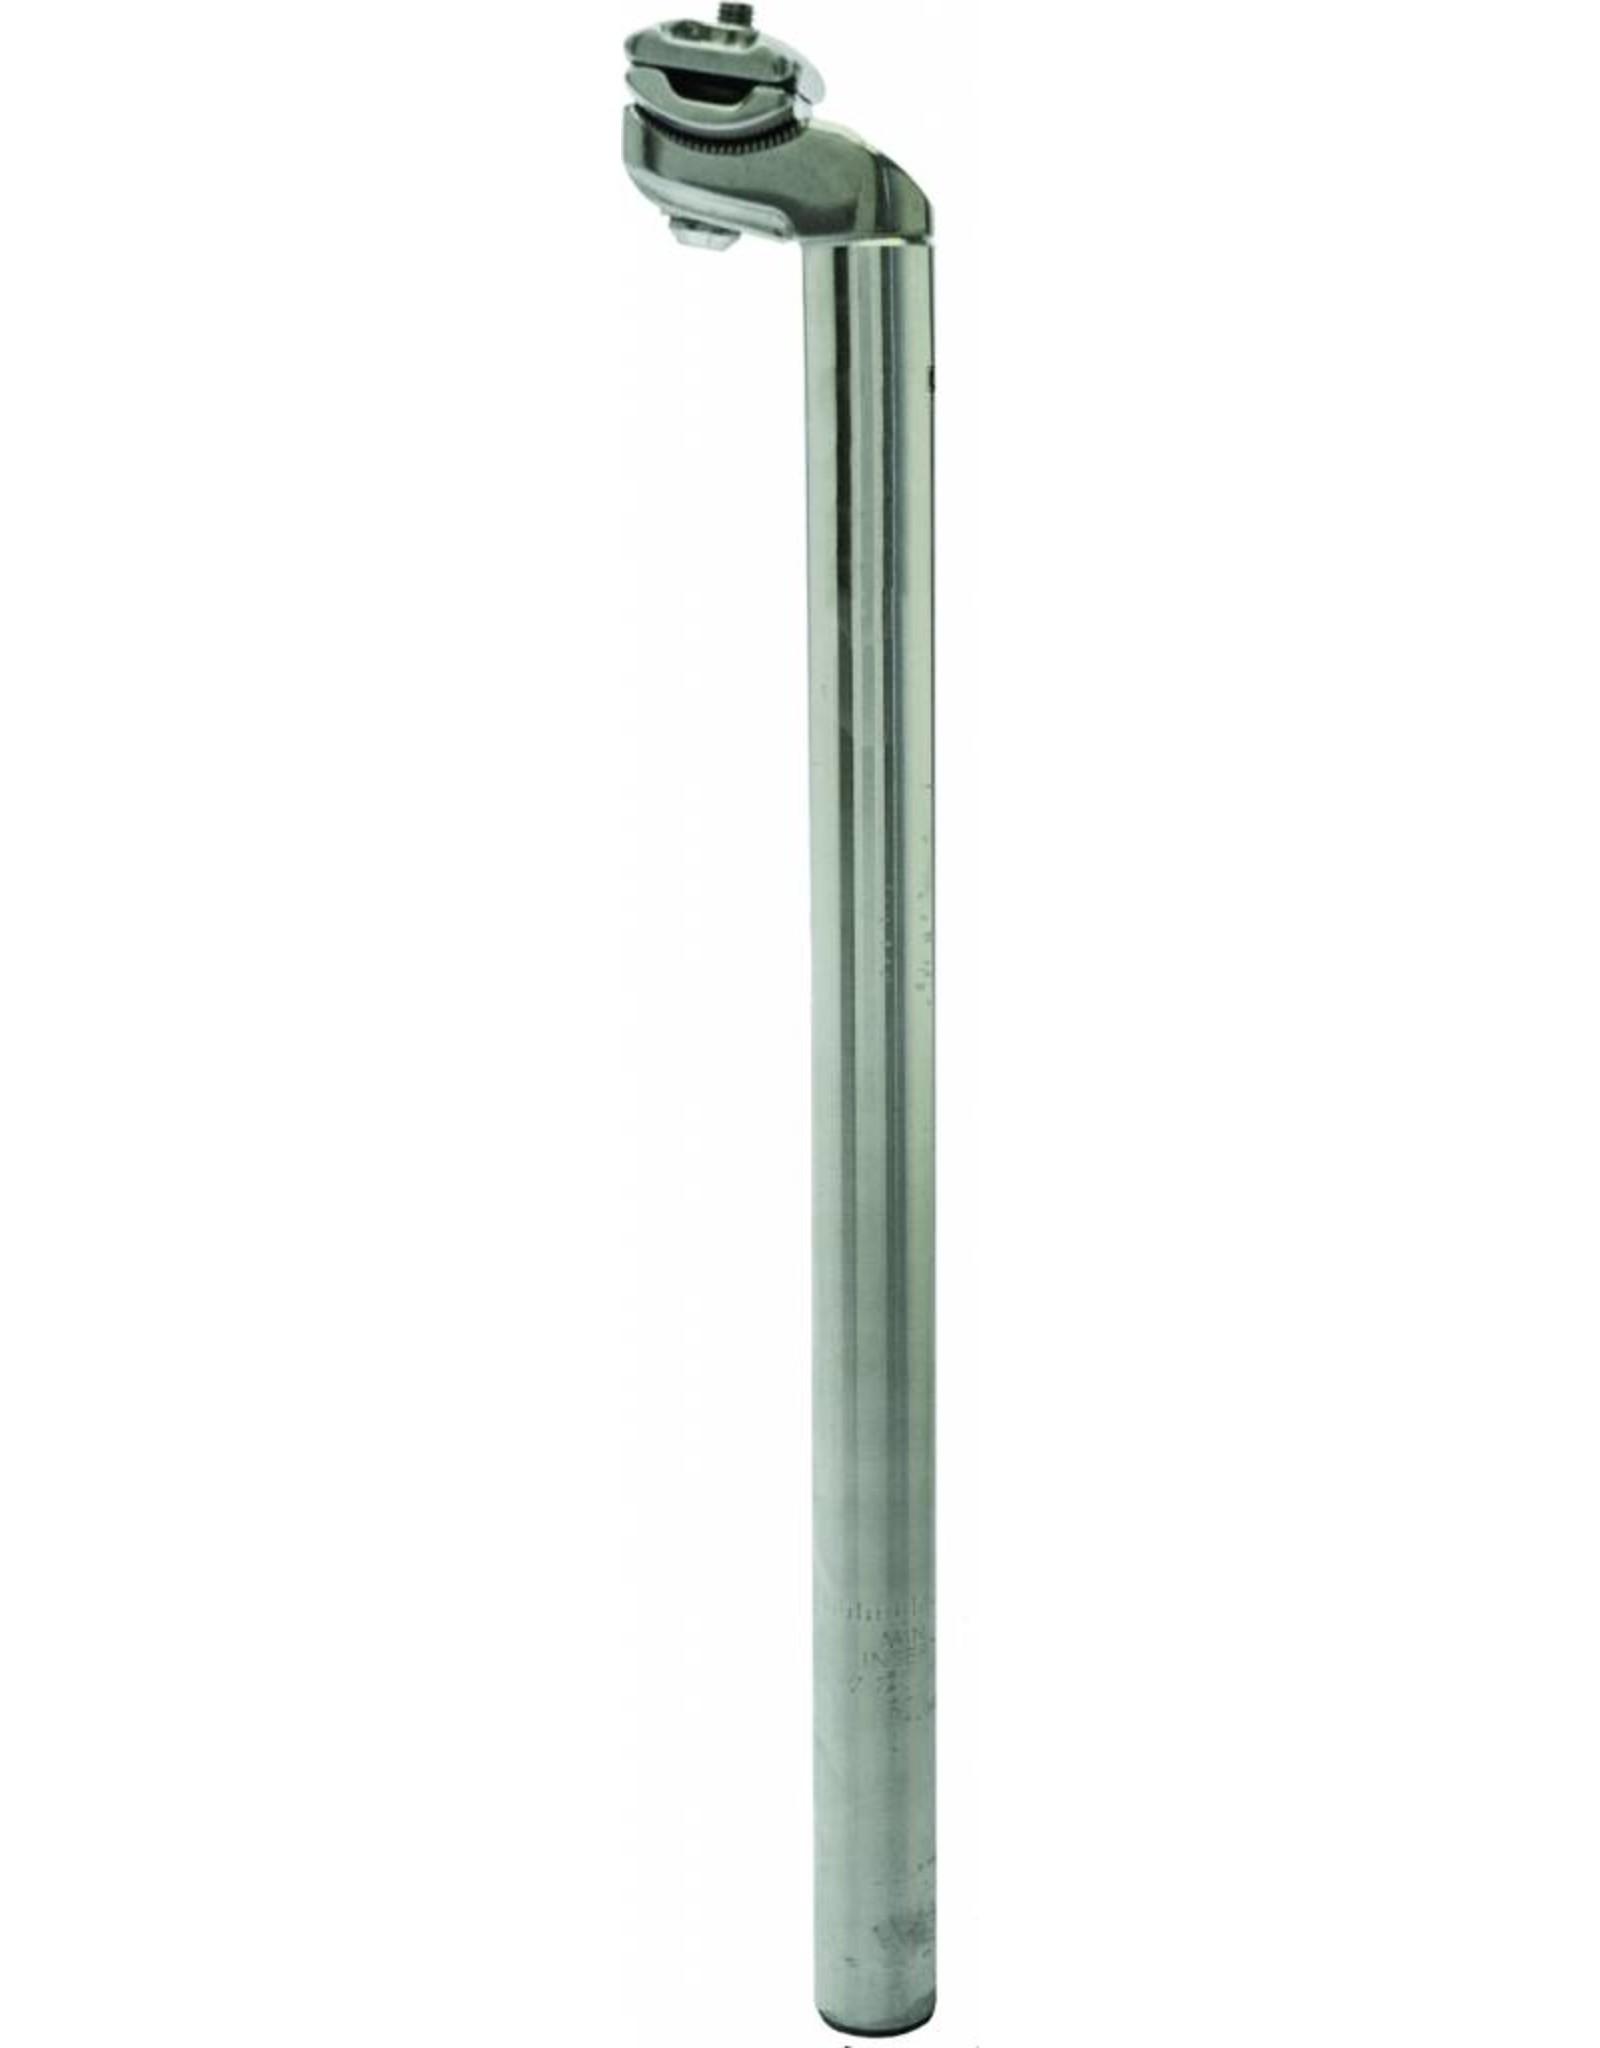 49N 25.8mm Alloy Seatpost